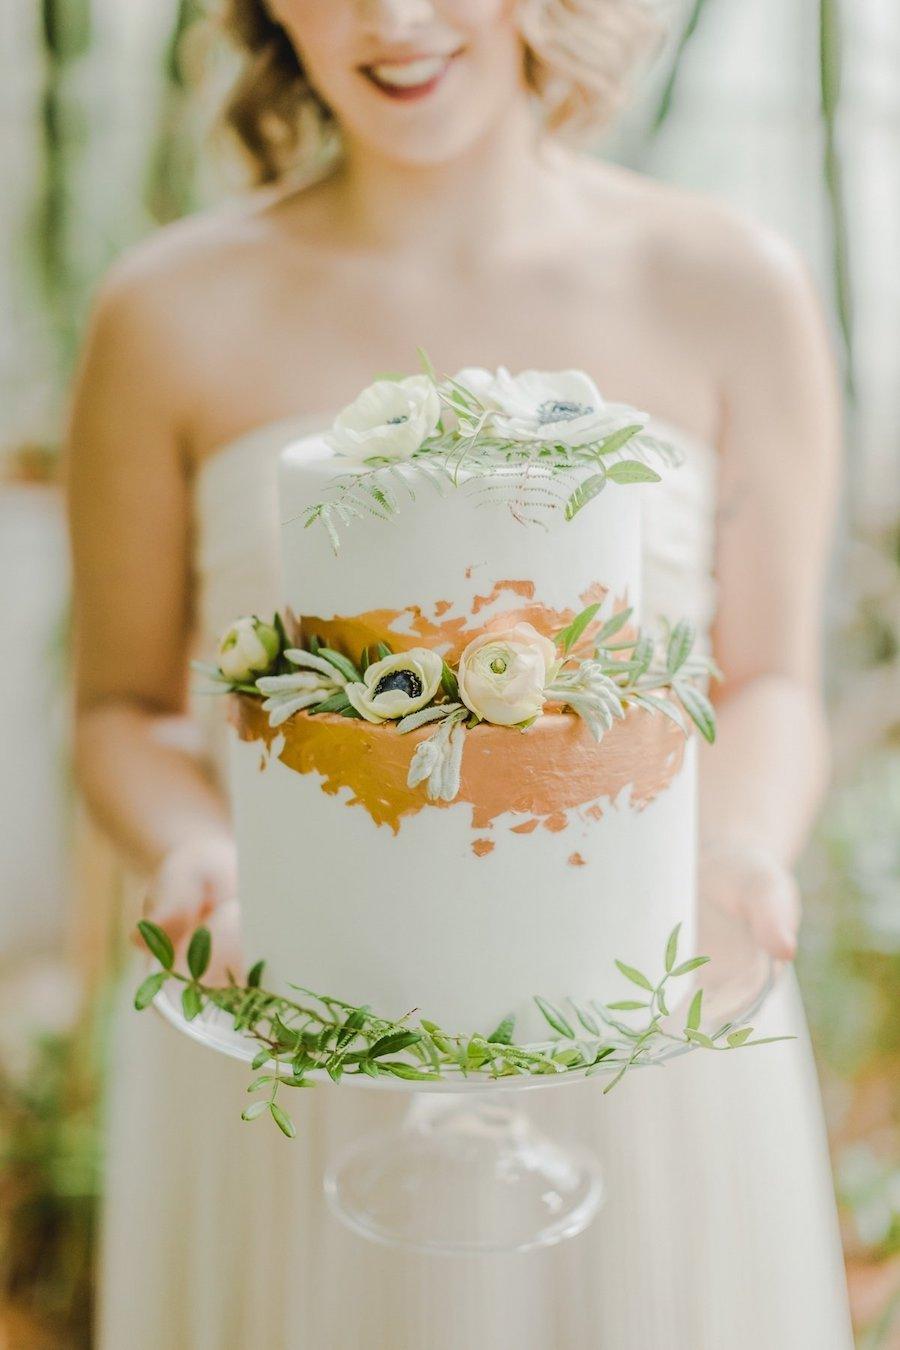 wedding cake bianca e oro rosa